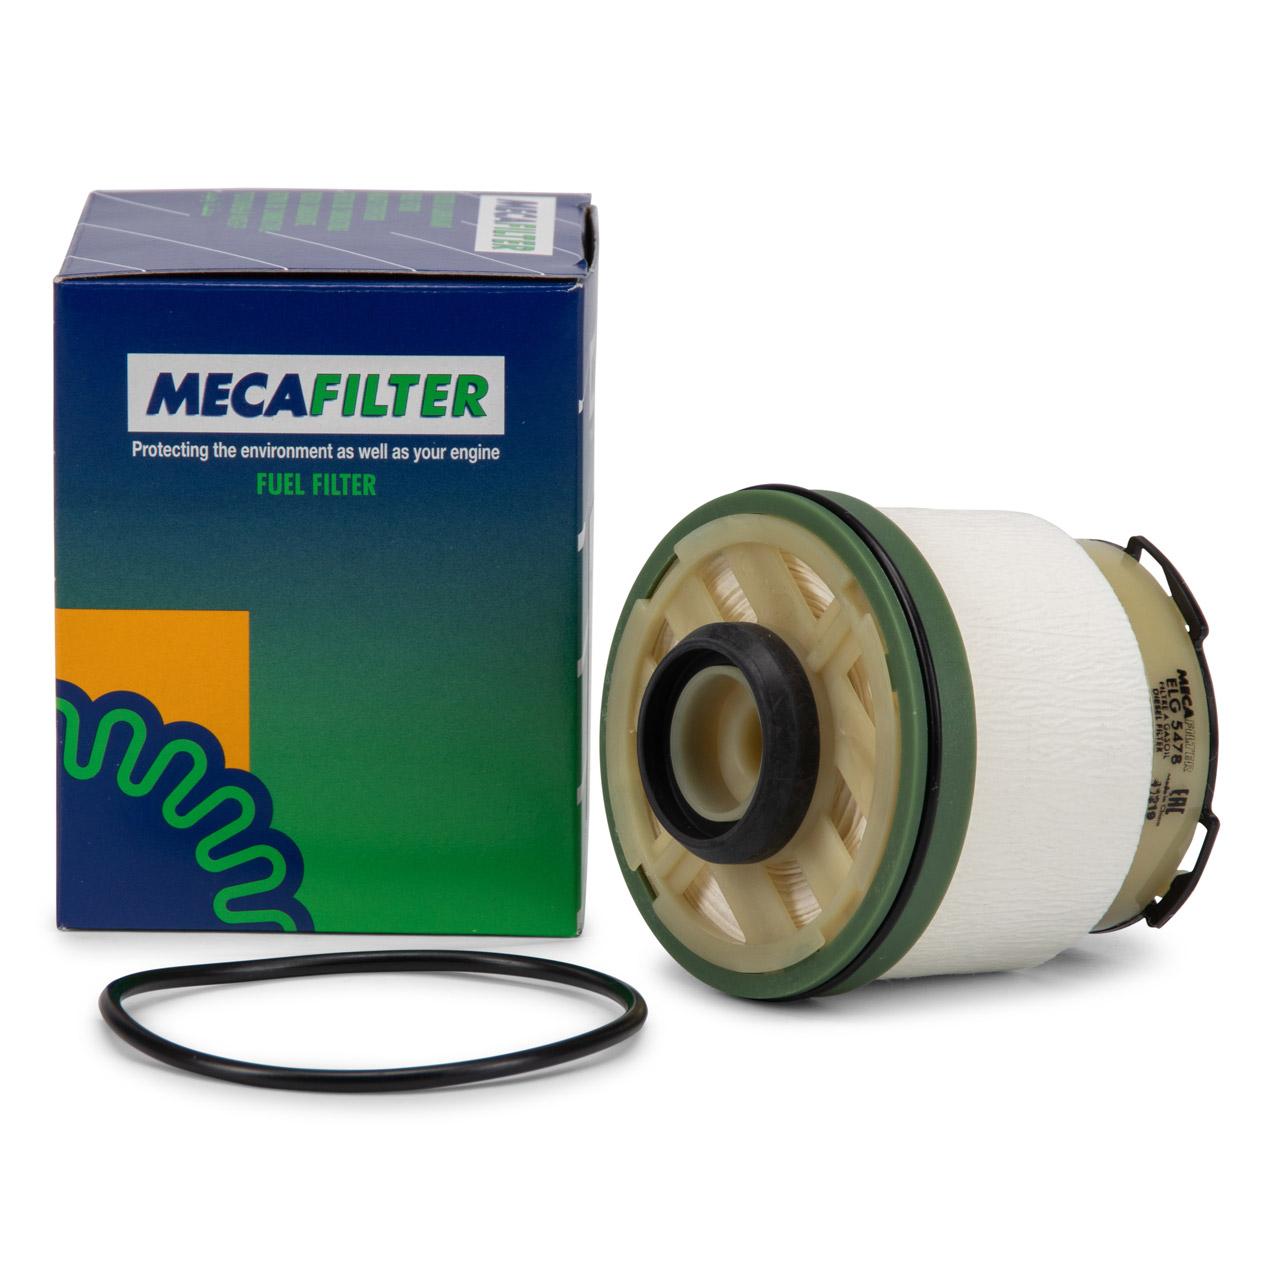 MECAFILTER Kraftstofffilter Dieselfilter FORD RANGER (TKE) 2.2/3.2 TDCi 1725552